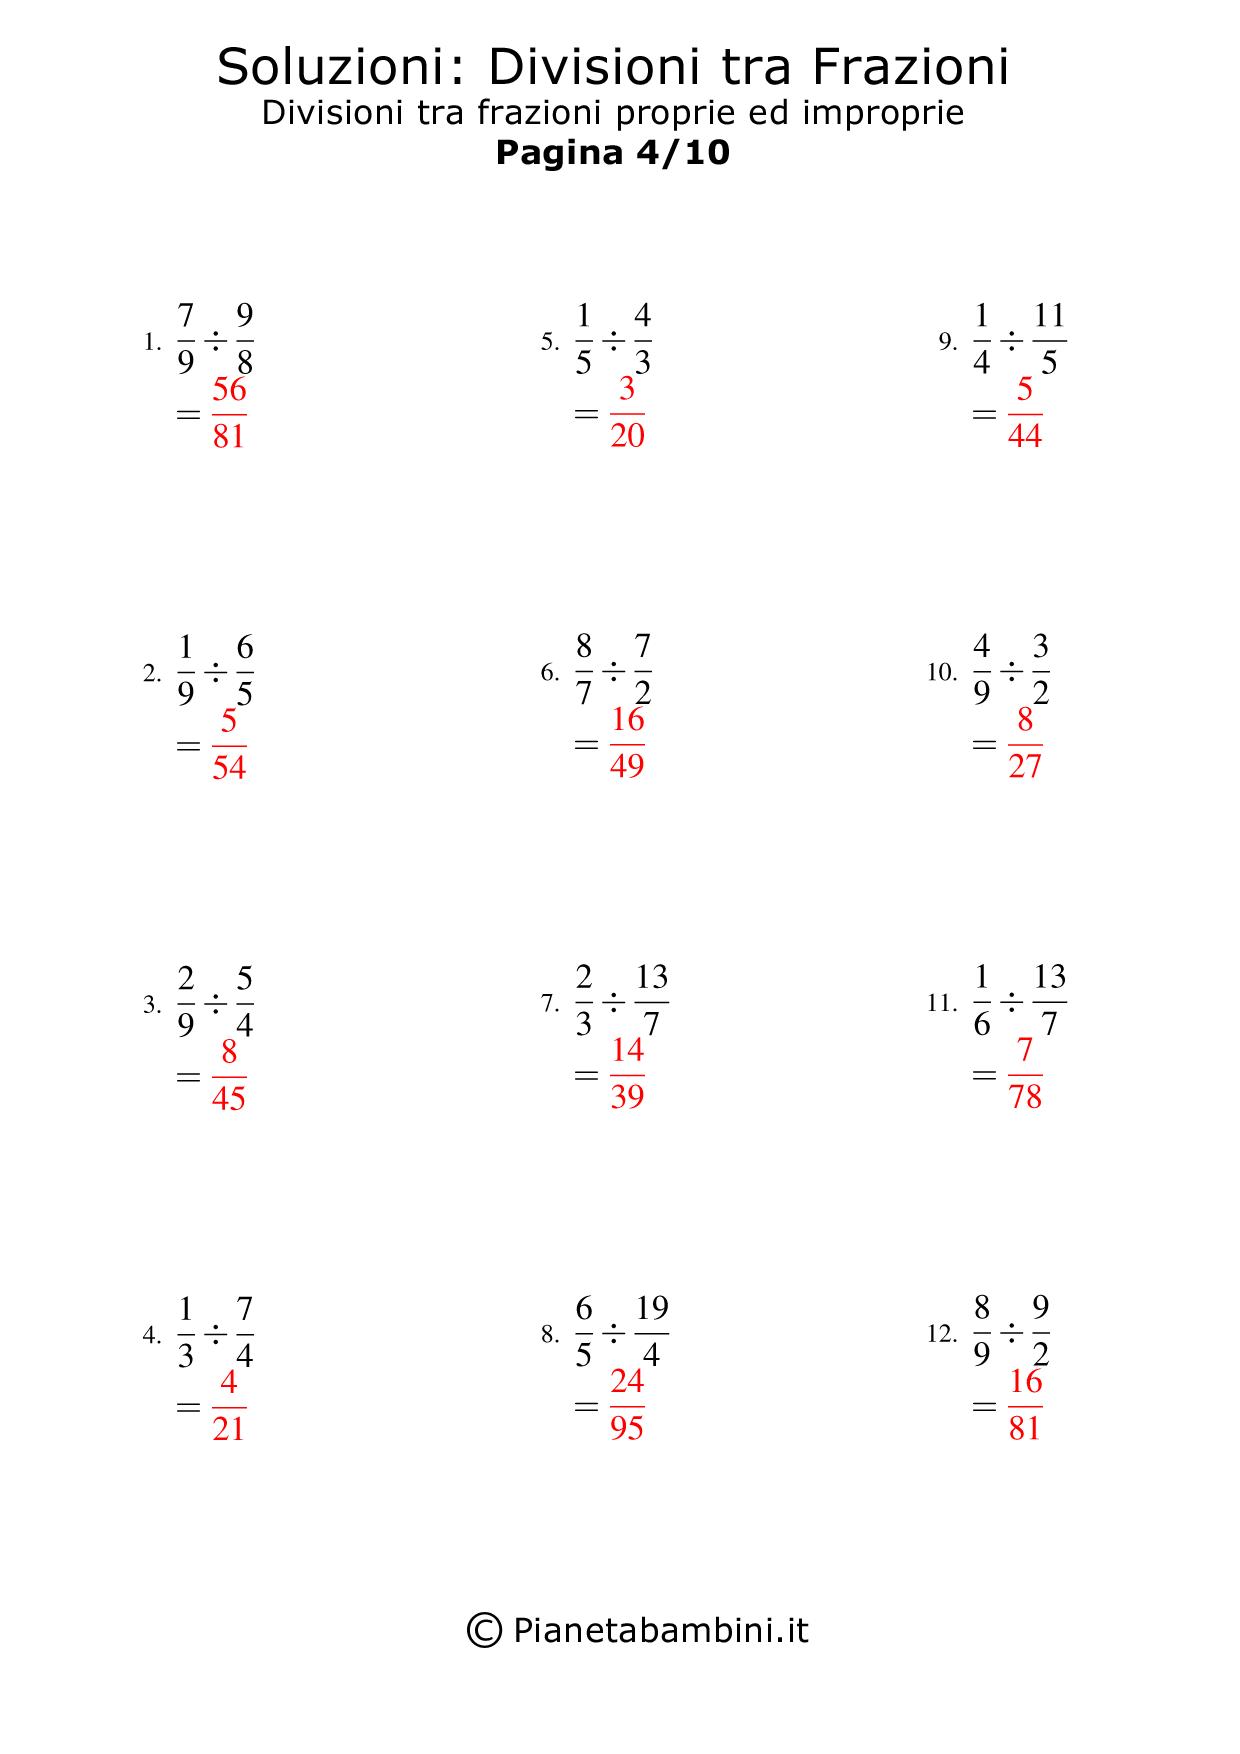 Soluzioni-Divisioni-Frazioni-Proprie-Improprie_04